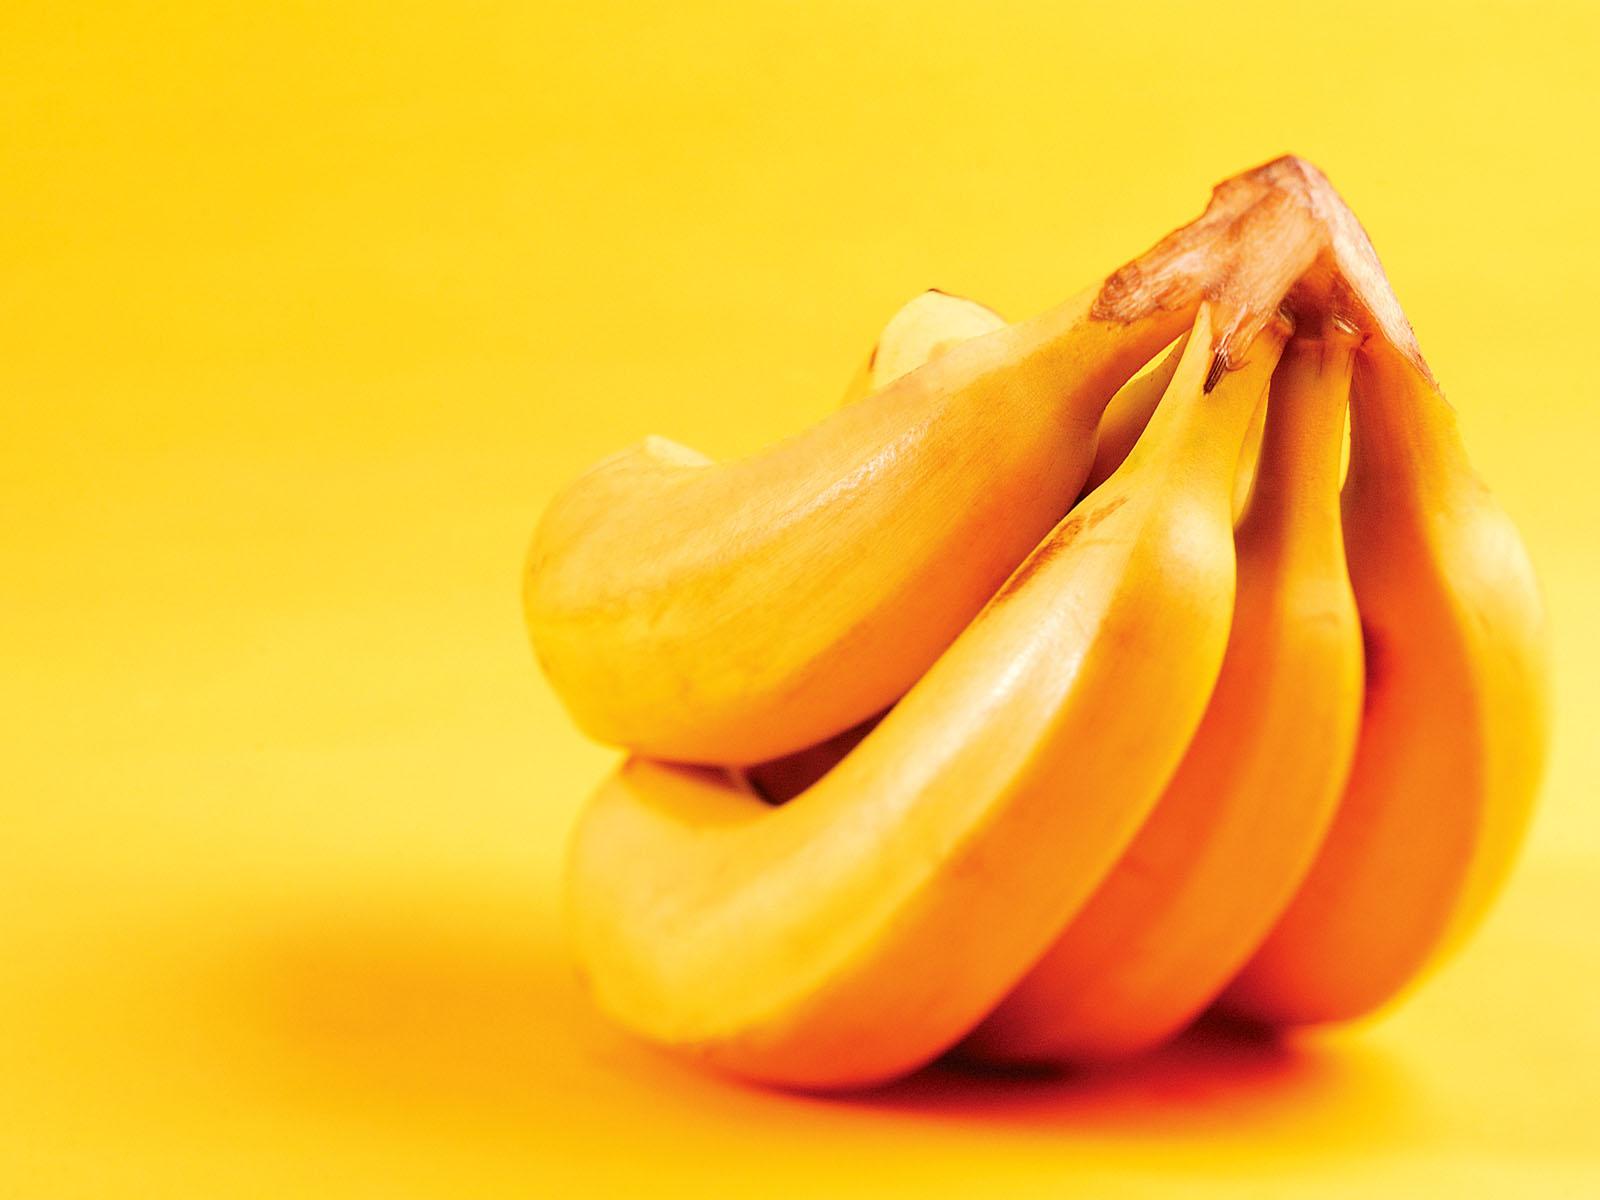 Yellow Banana Wallpaper HD Wallpaper | WallpaperLepi